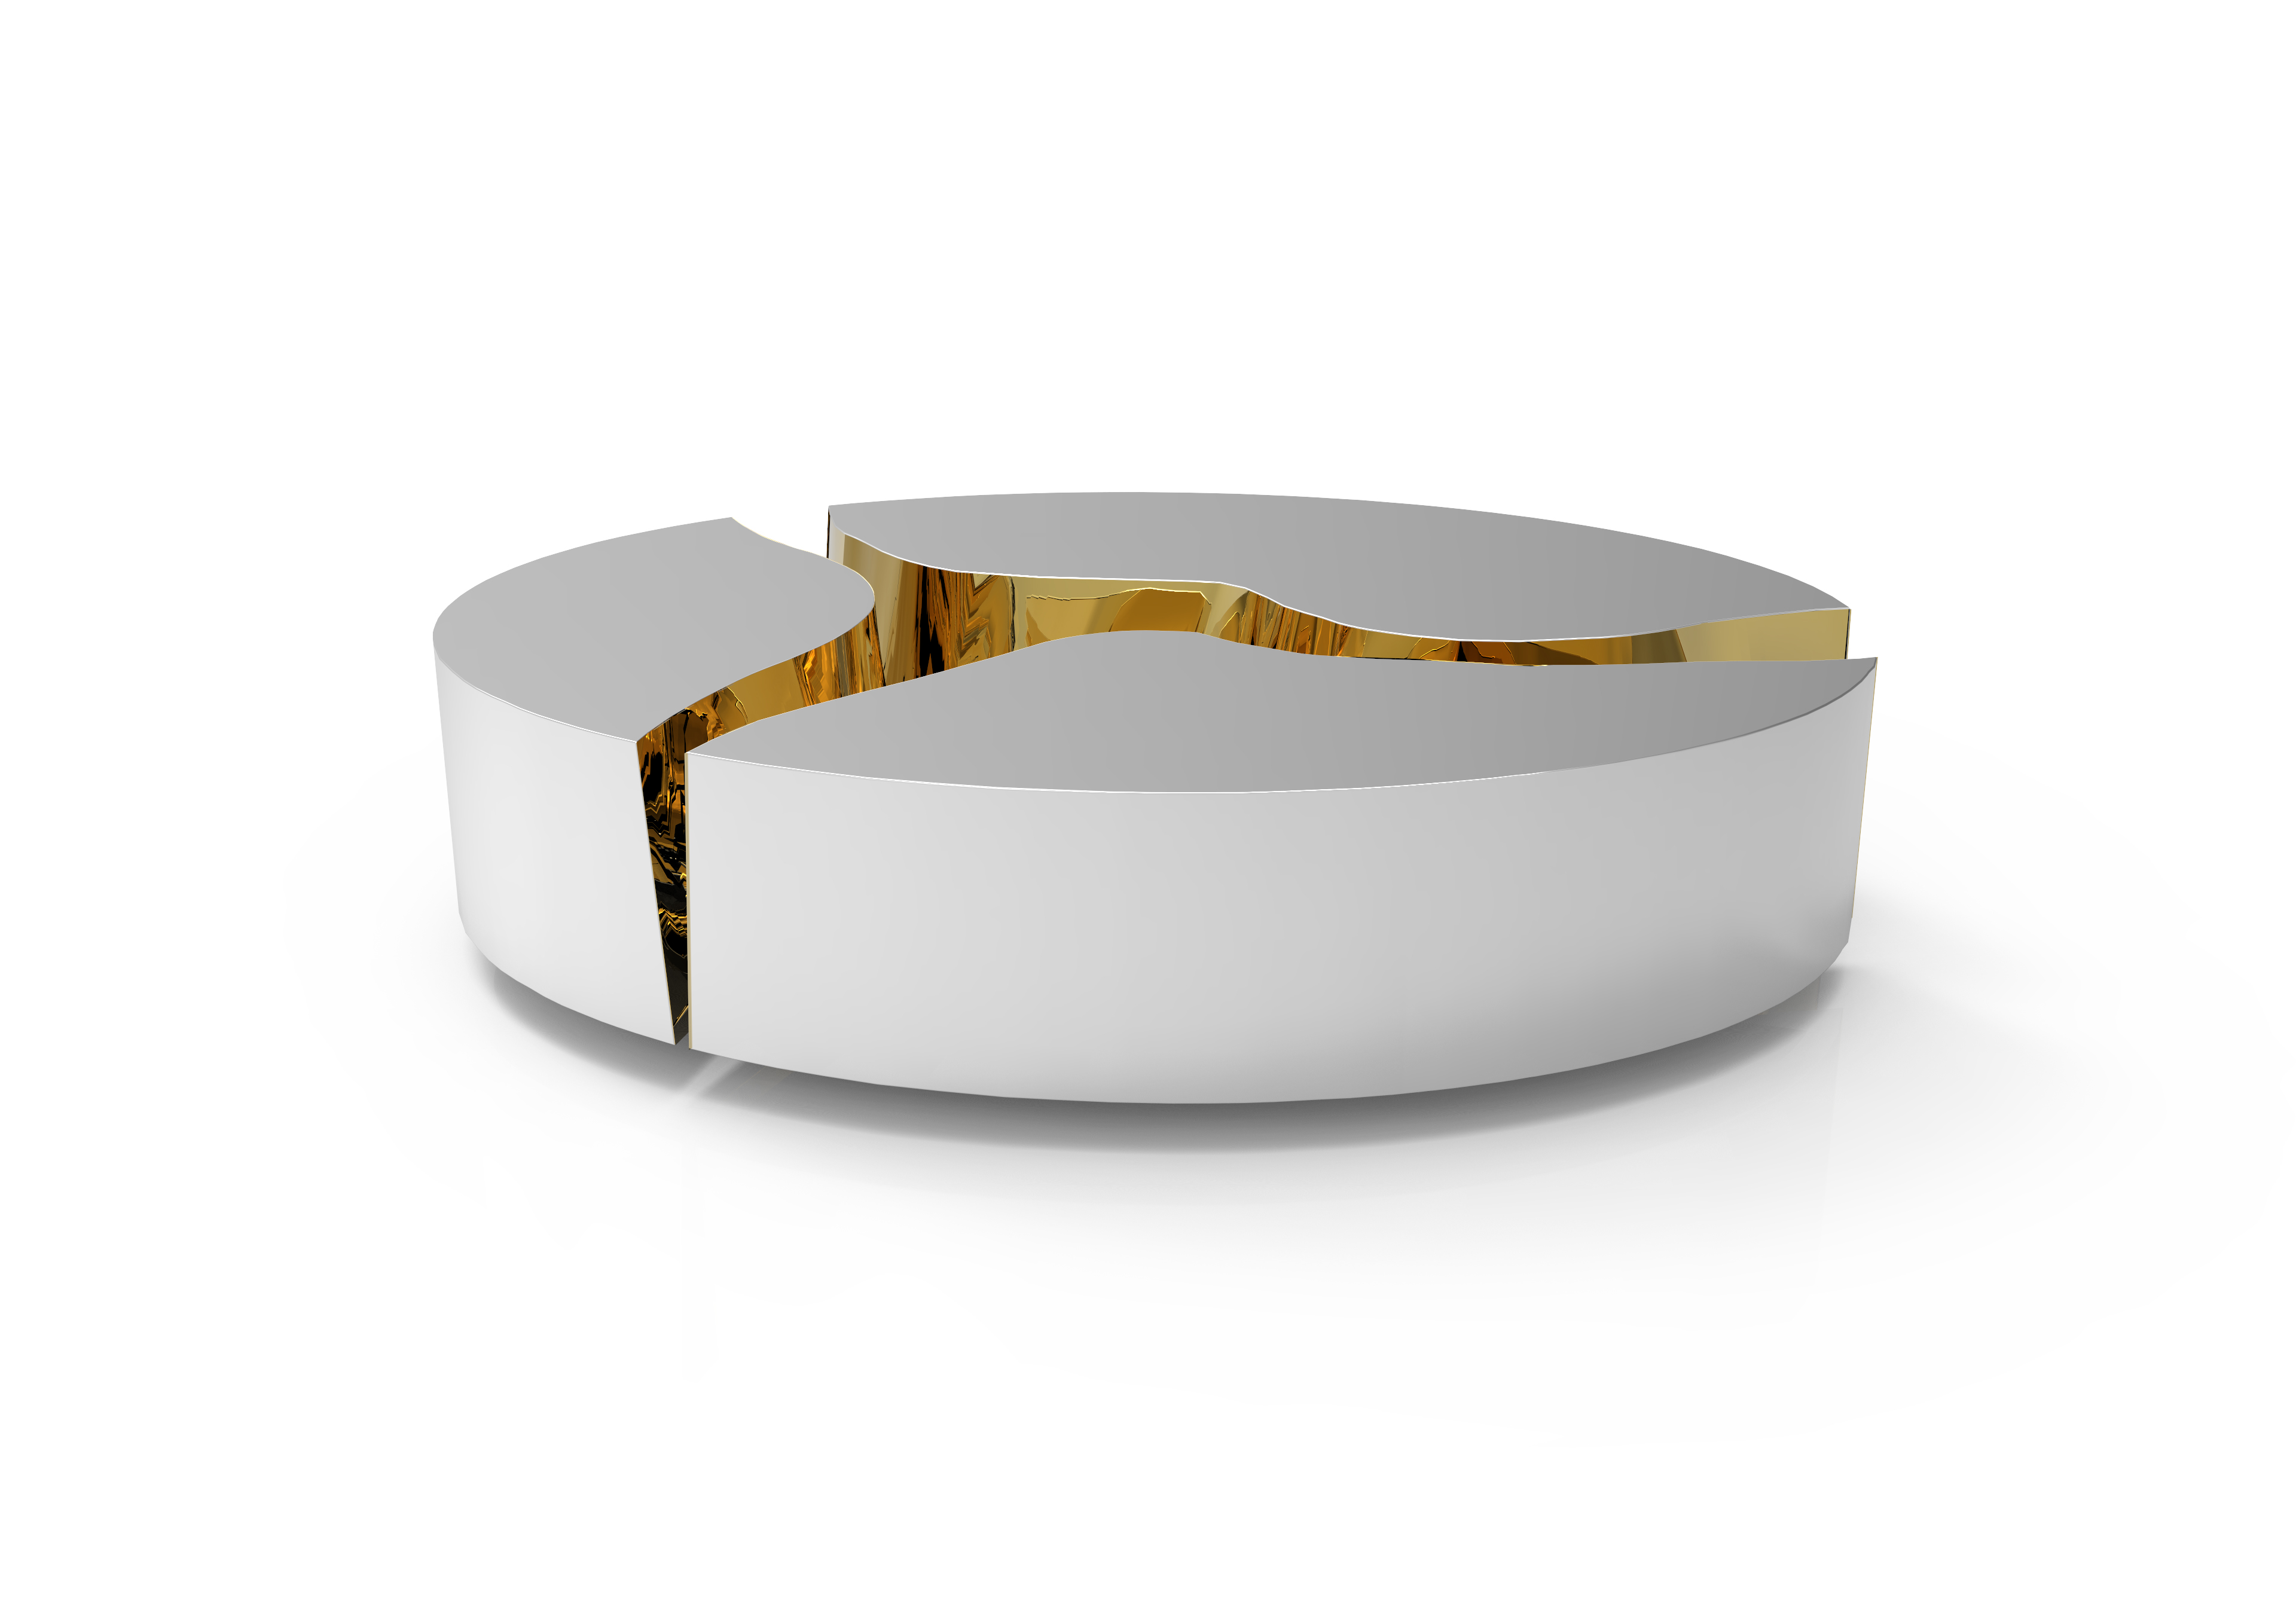 Top 5 Luxus Couchtische mit moderem Design Kaffeetische Top 5 Luxus Kaffeetische mit moderem Design lapiaz oval inox 02